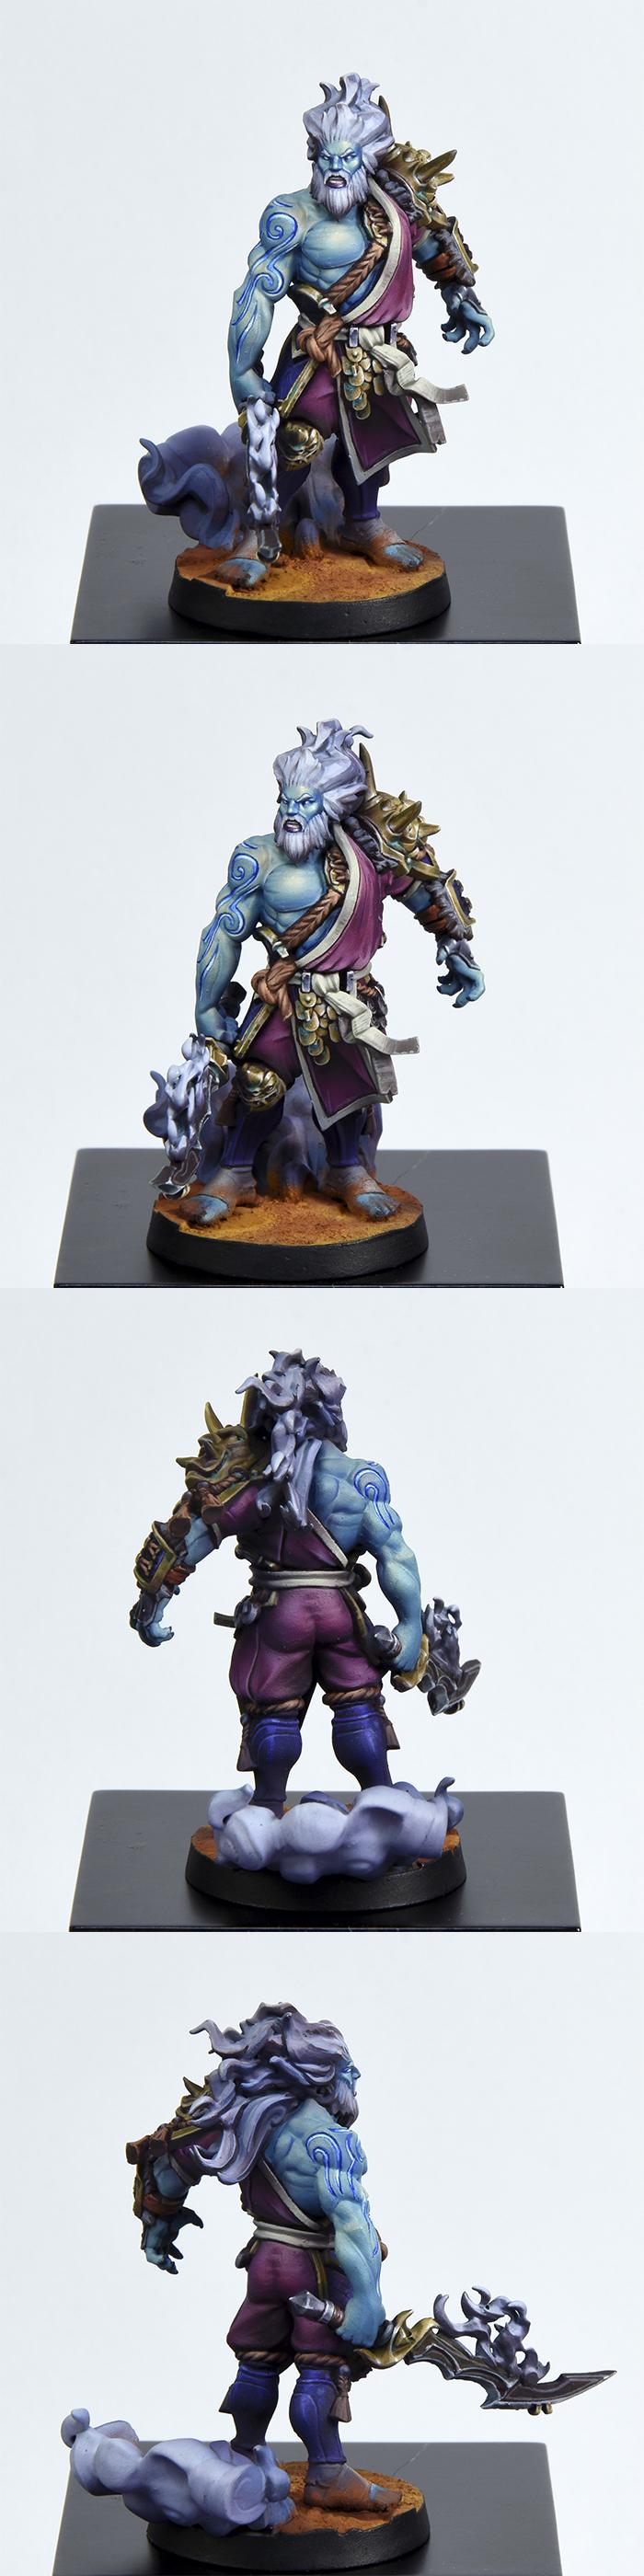 Tempest, the Stormborn